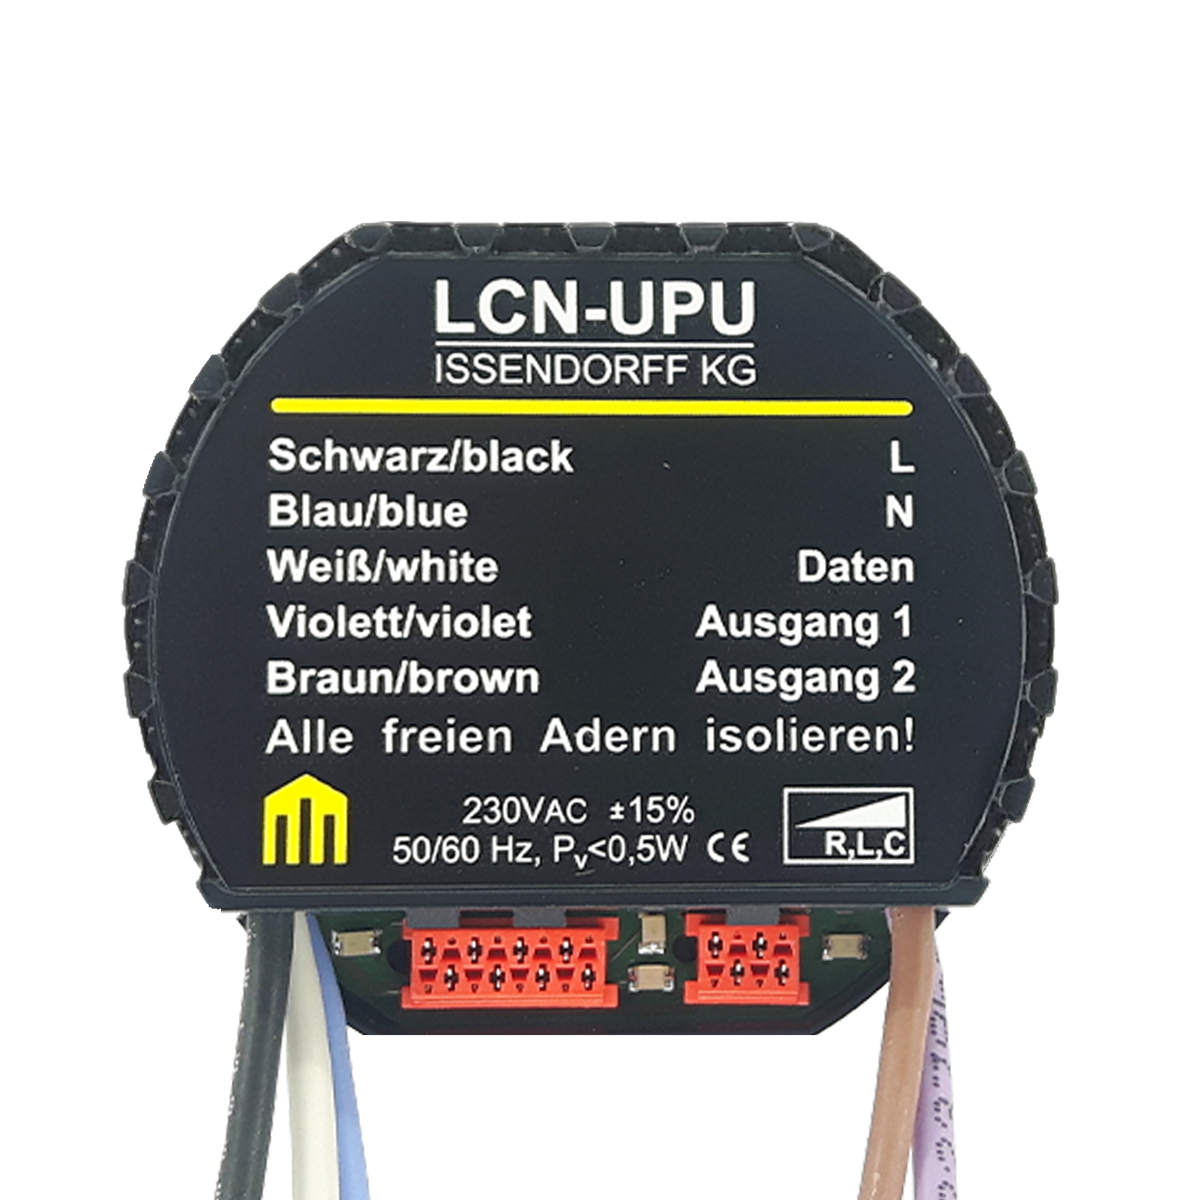 LCN-UPU